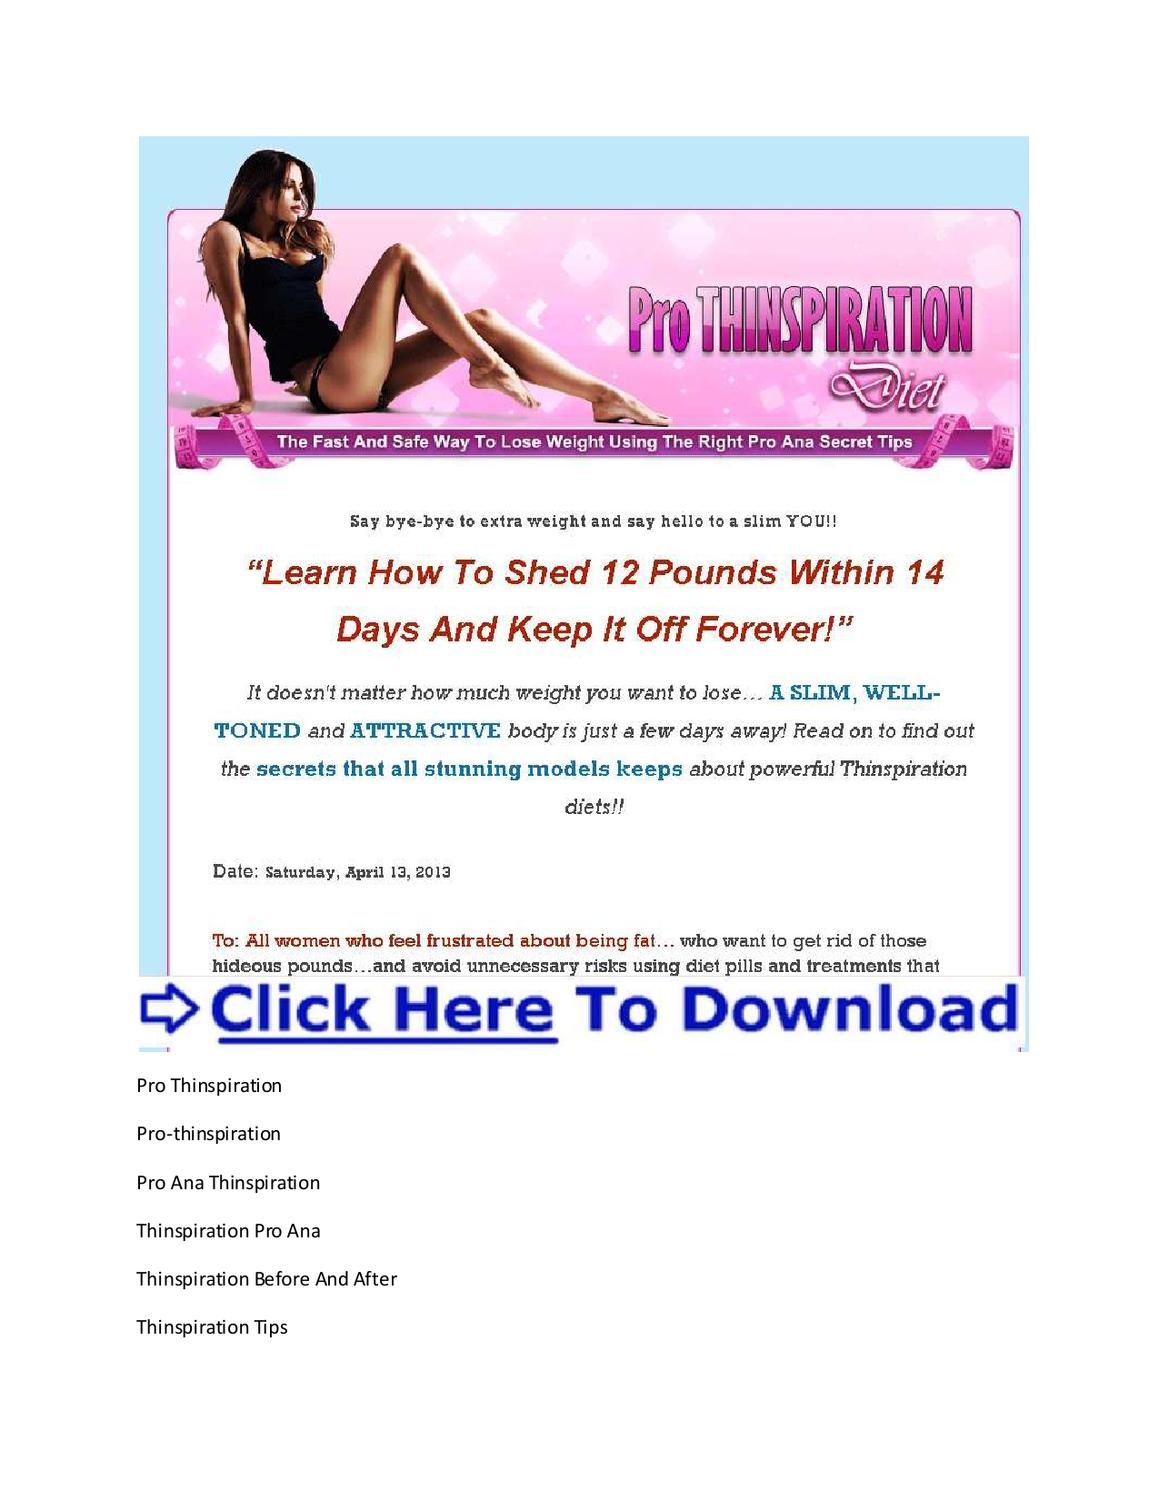 Skinny bunny tea weight loss reviews